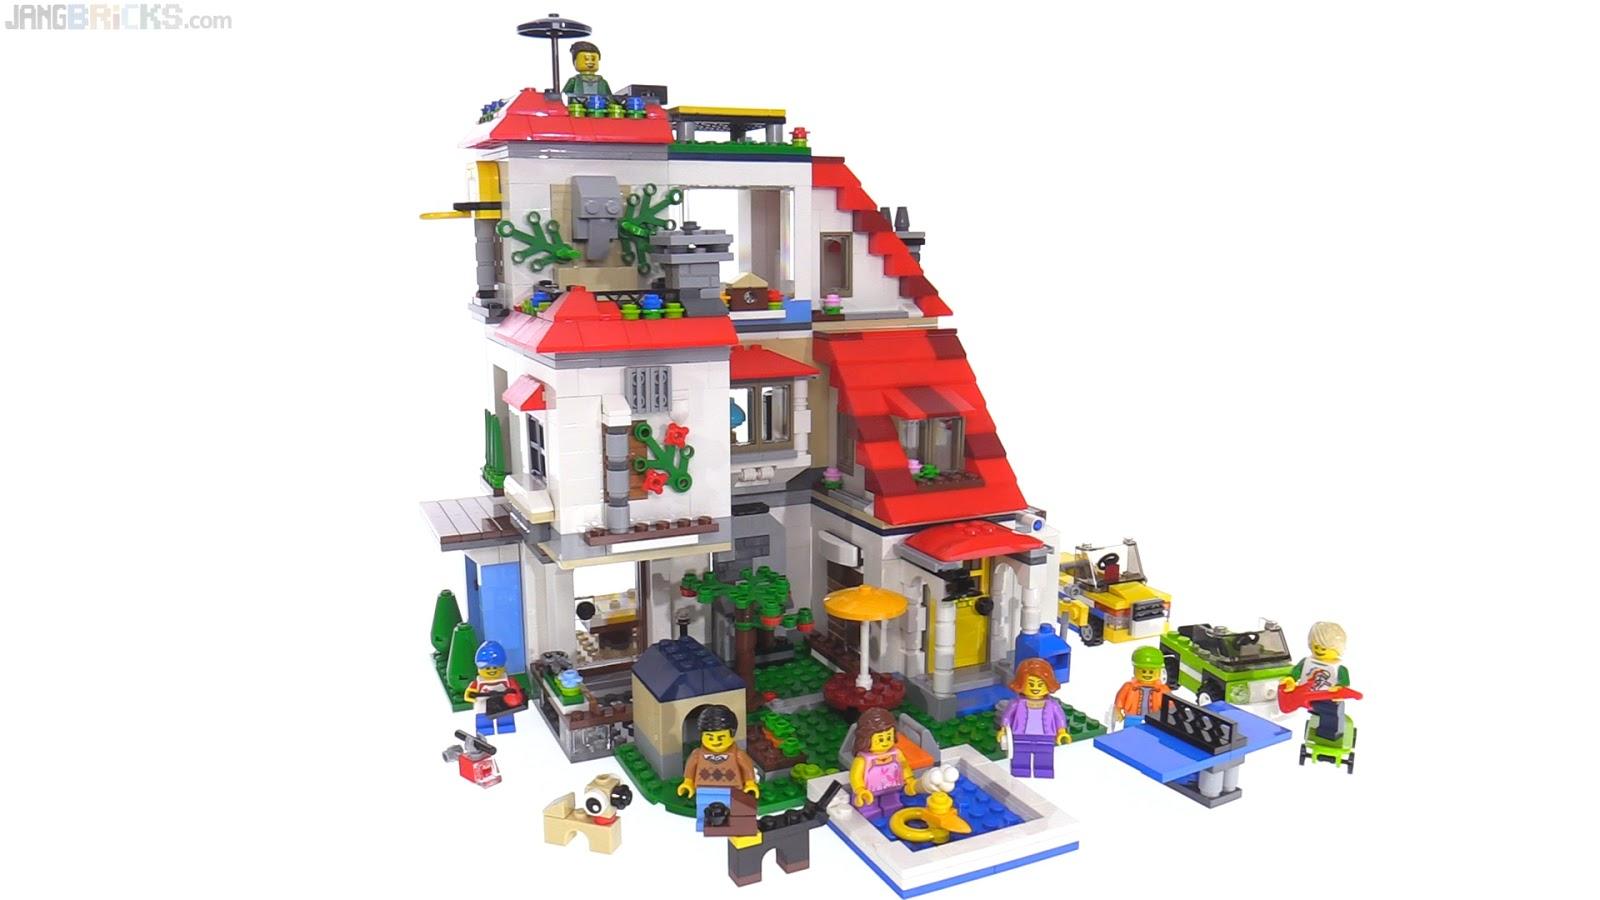 lego creator modular house super build 31067 31068 31069 combination. Black Bedroom Furniture Sets. Home Design Ideas